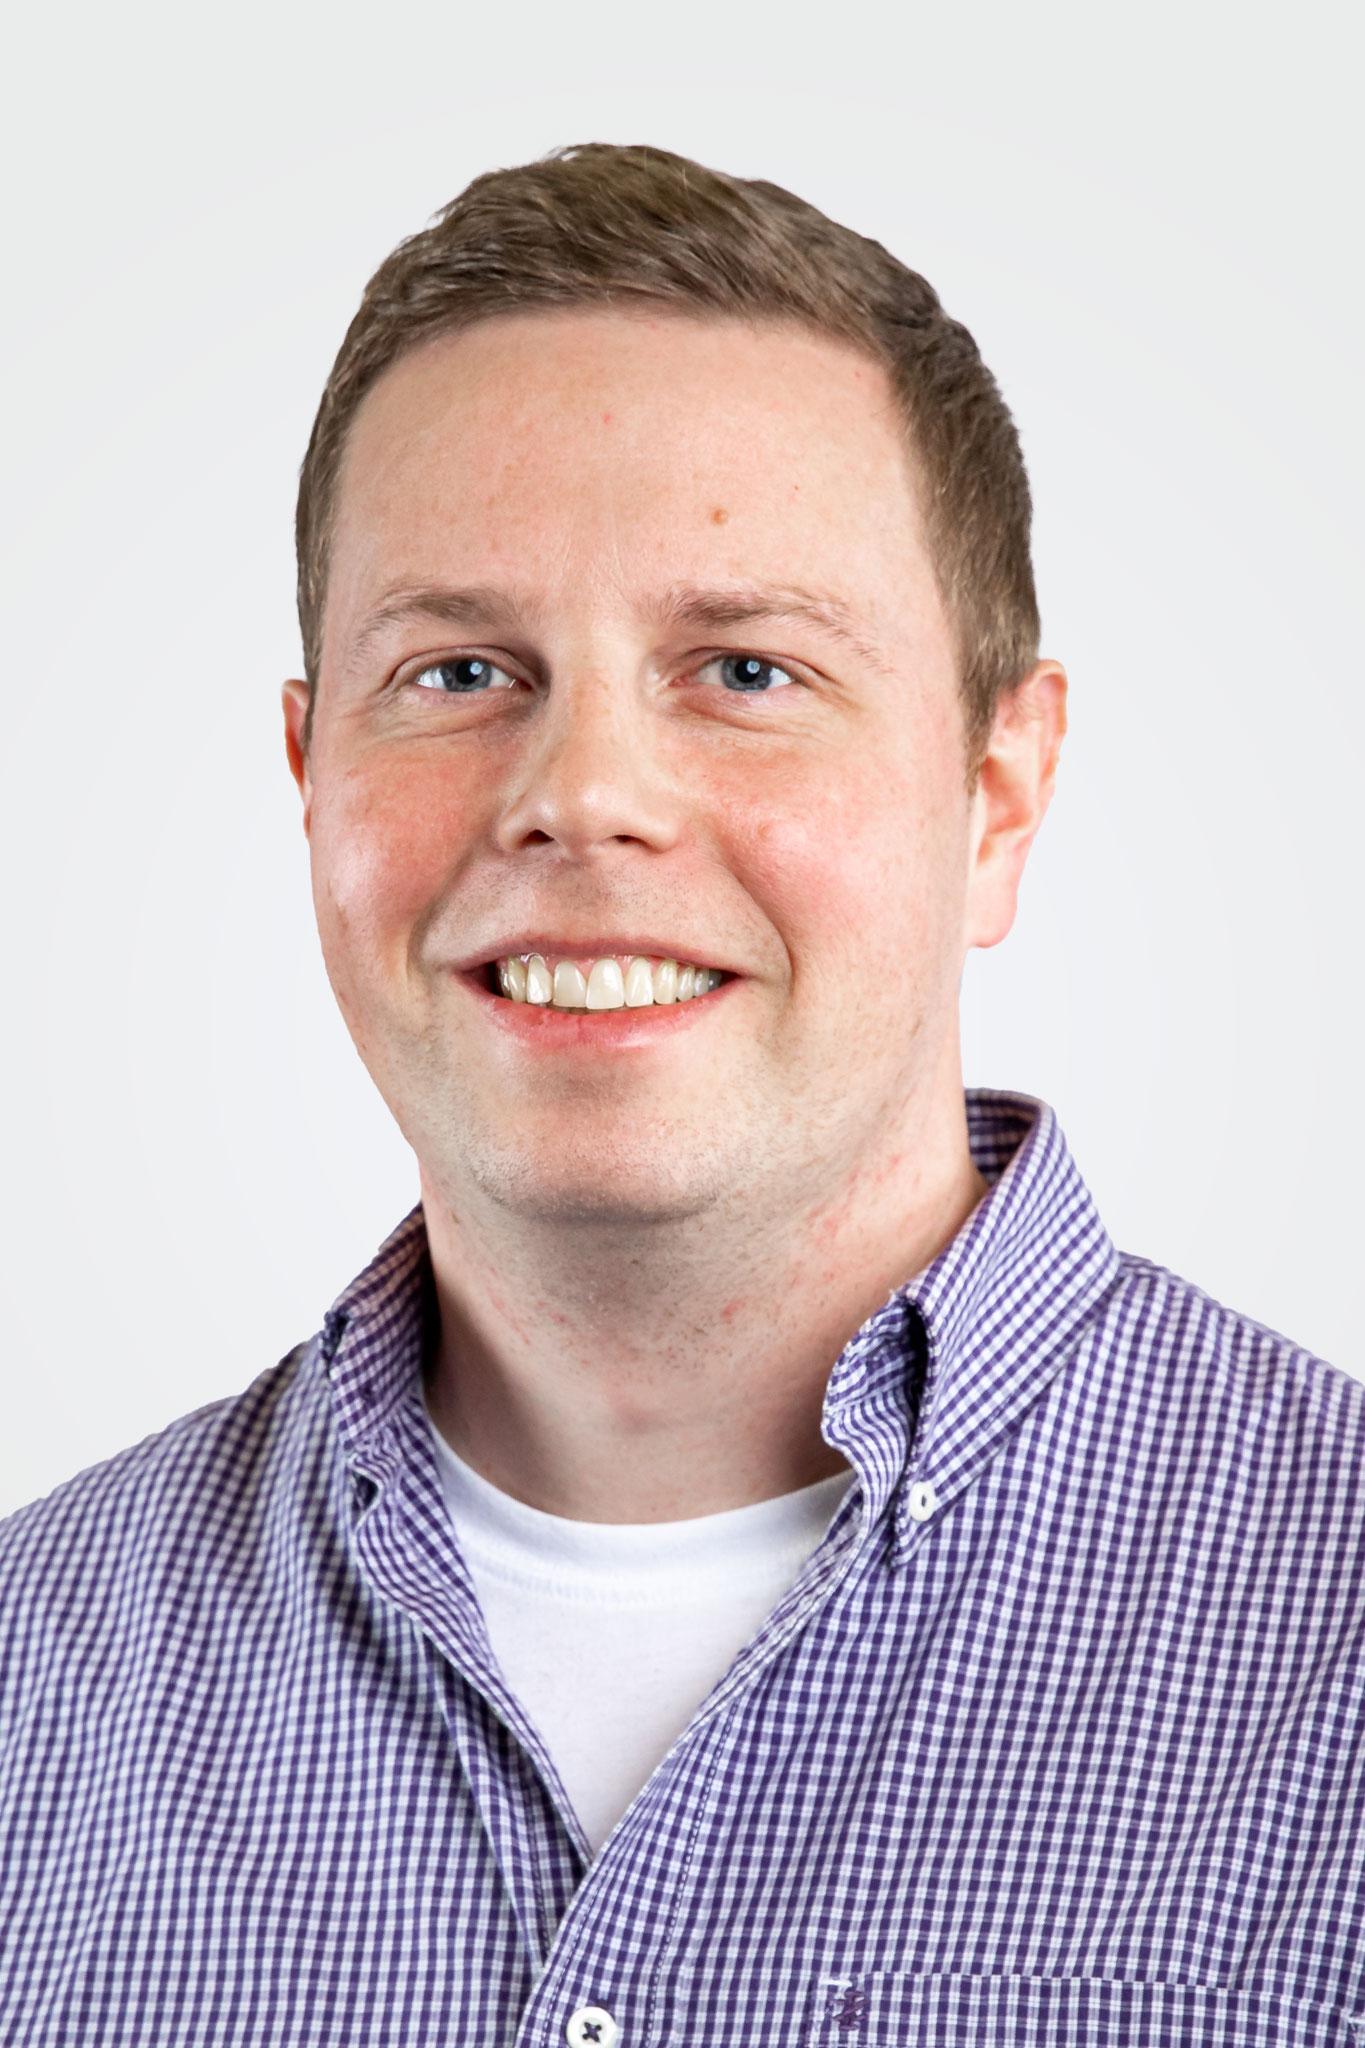 Headshot of Mike Stone